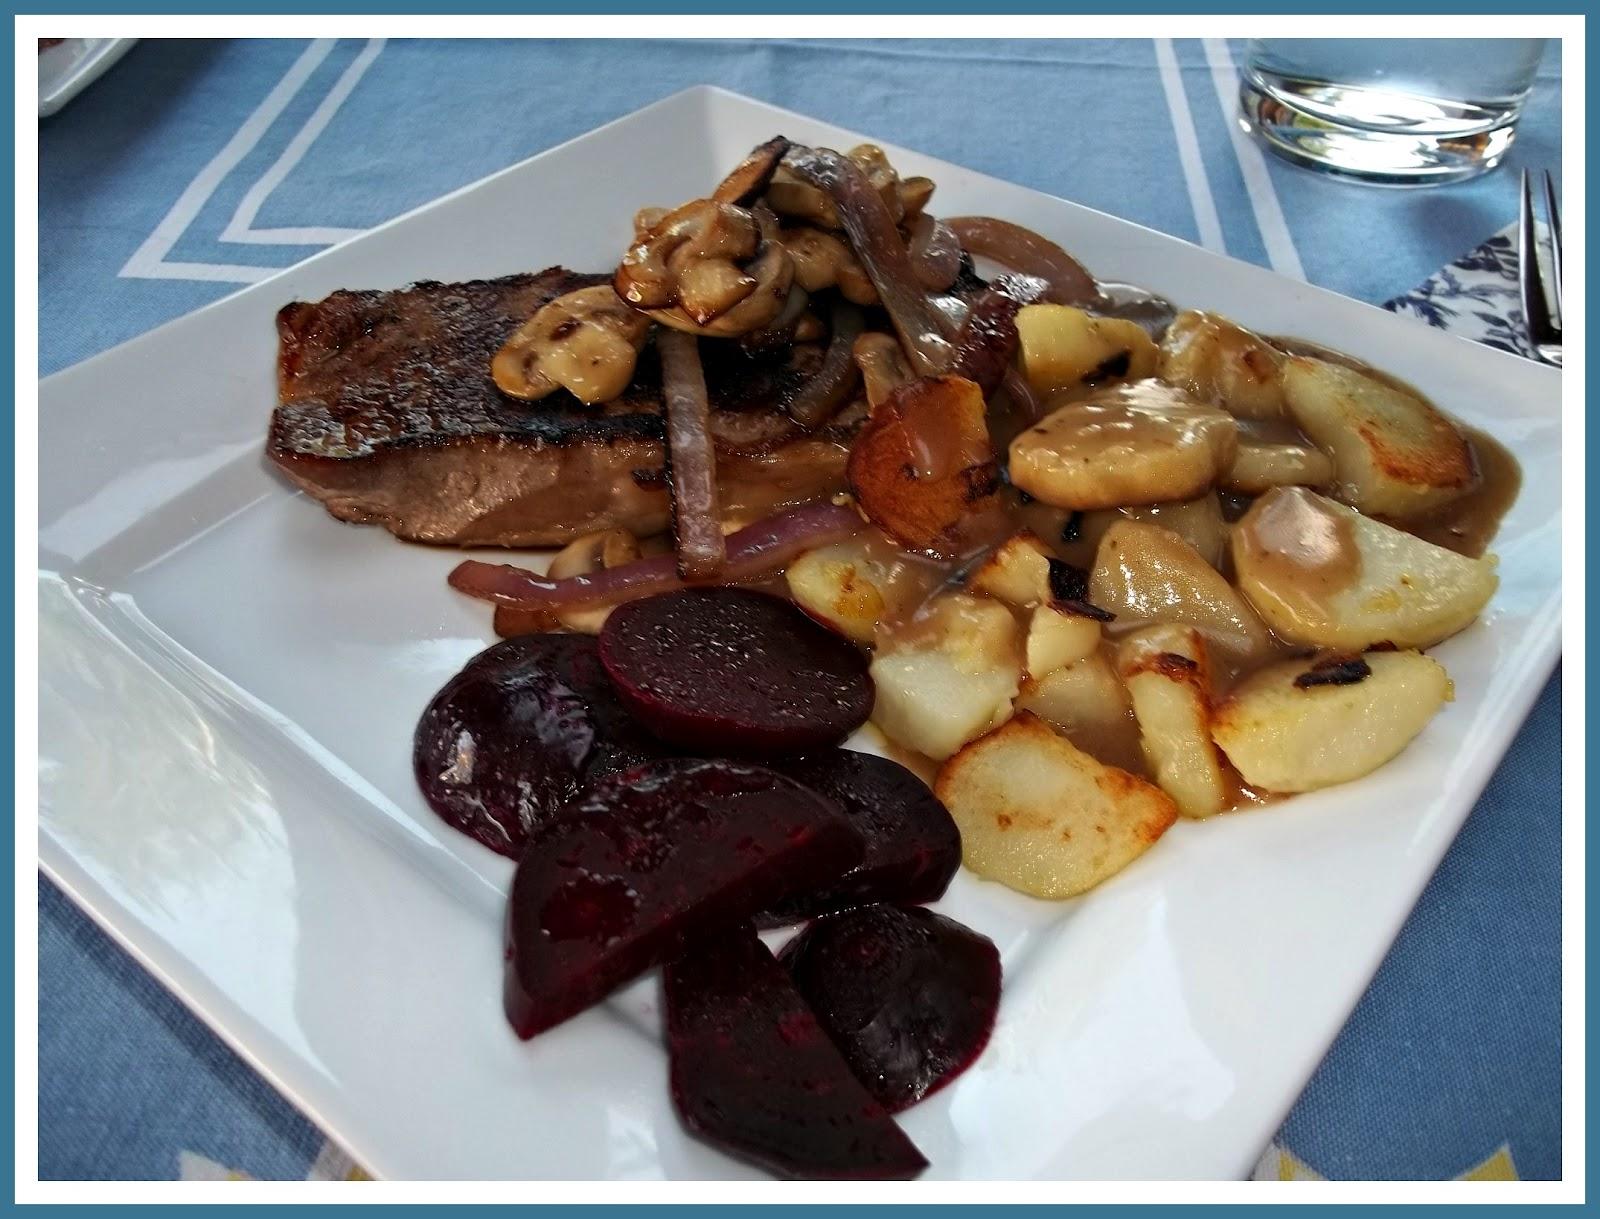 dinner at julie's: Pan-Fried Steak